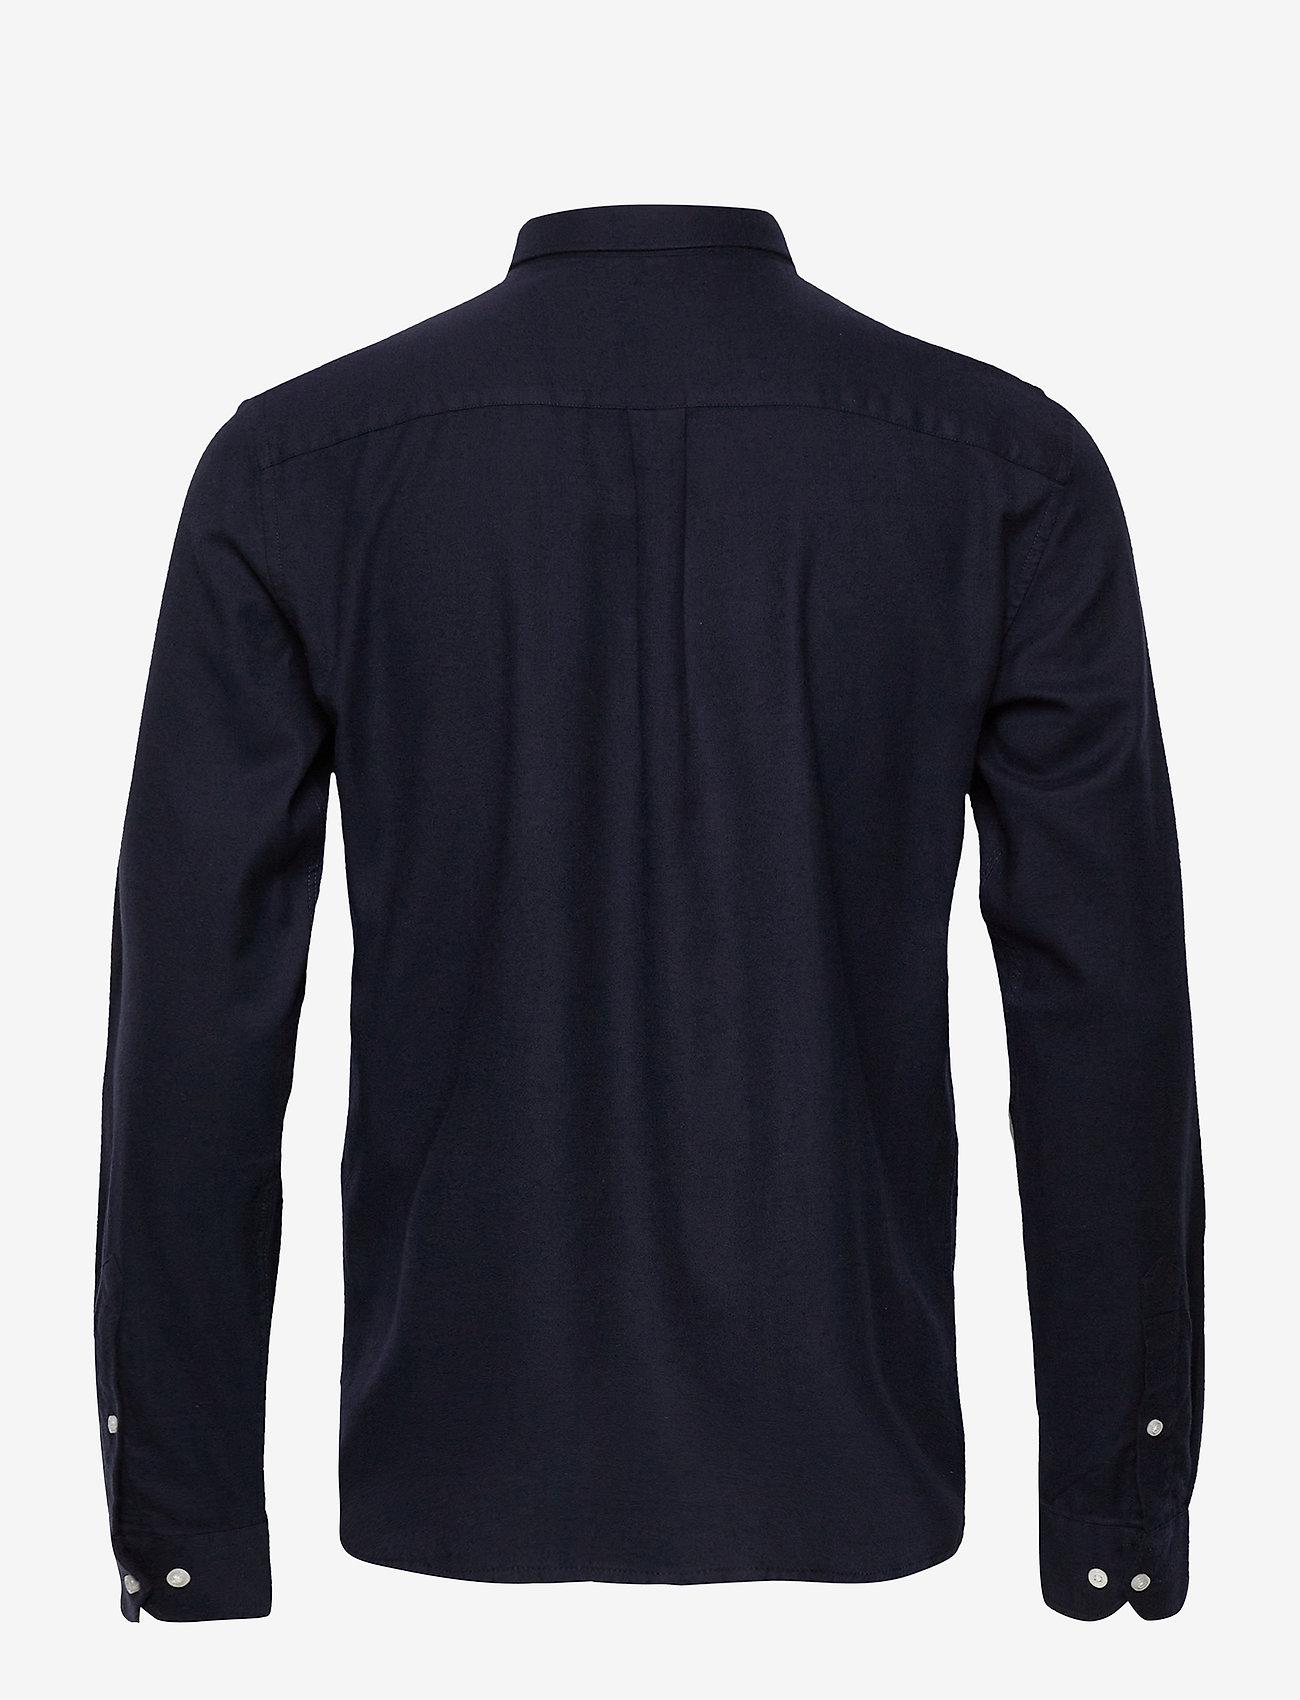 Harrison B.d. Brushed Shirt (Dark Navy) (81.75 €) - Les Deux W4U1J